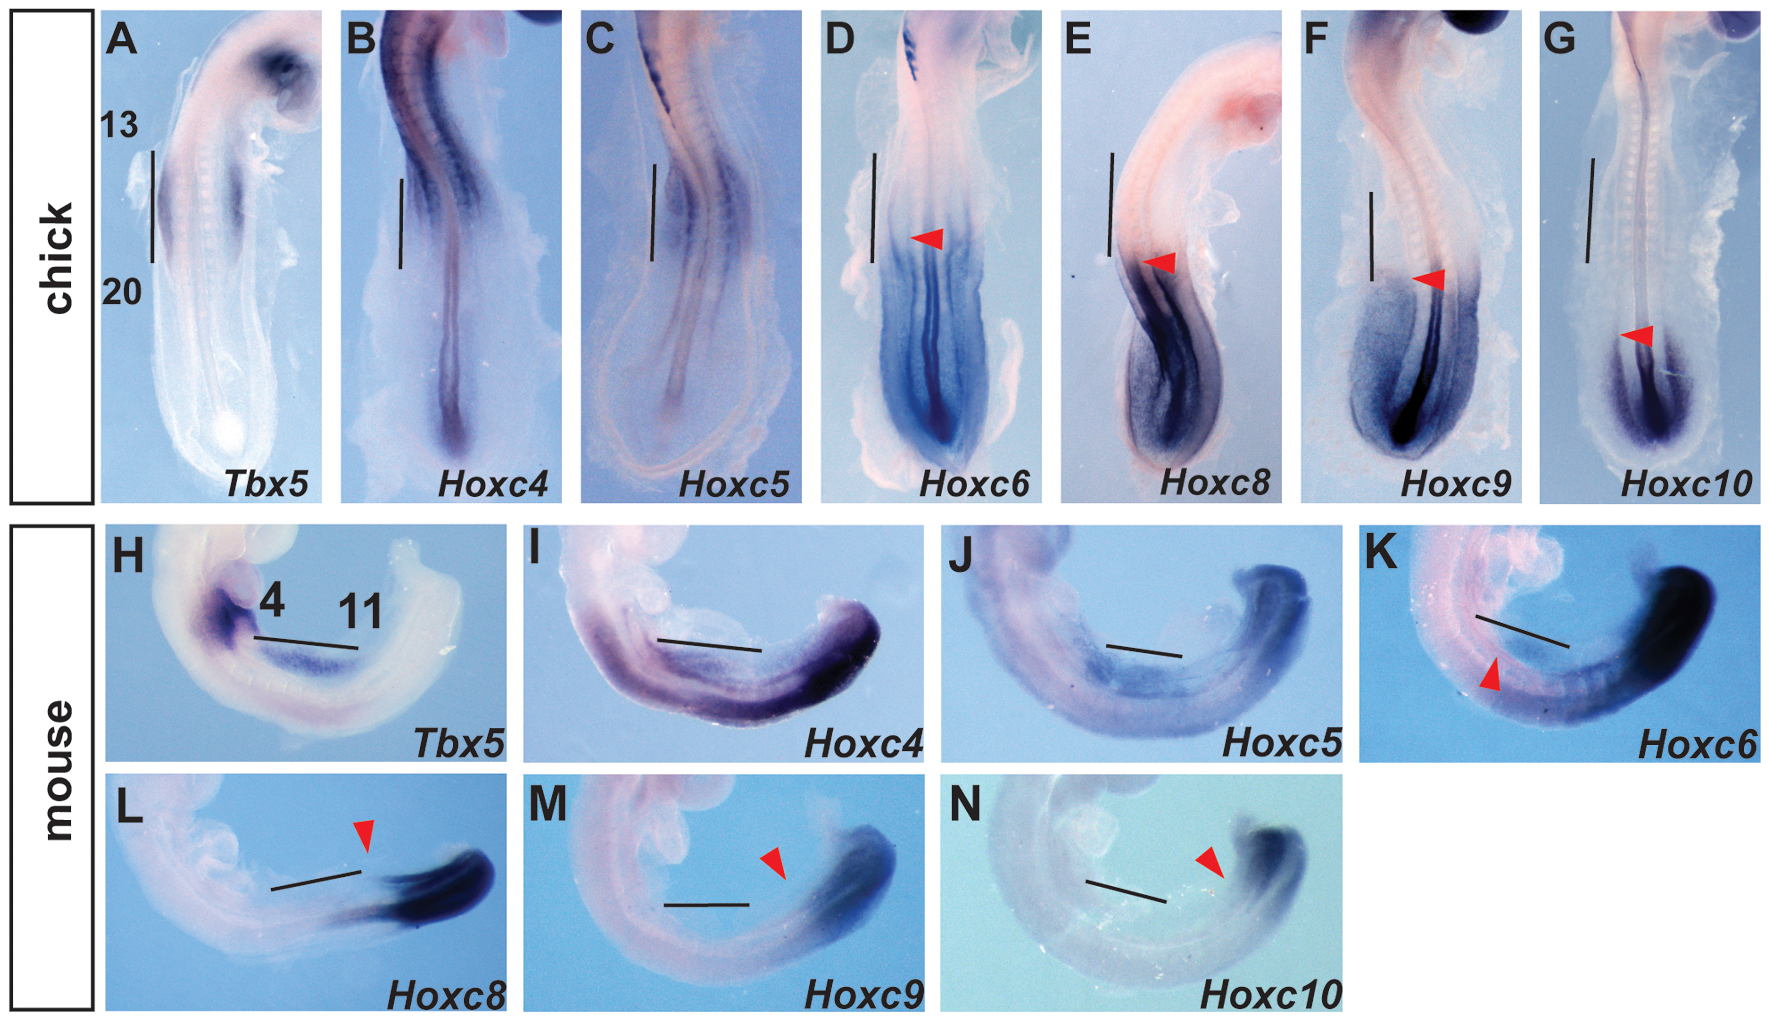 Comparison of <i>Tbx5</i> and <i>HoxC</i> gene expression domains.